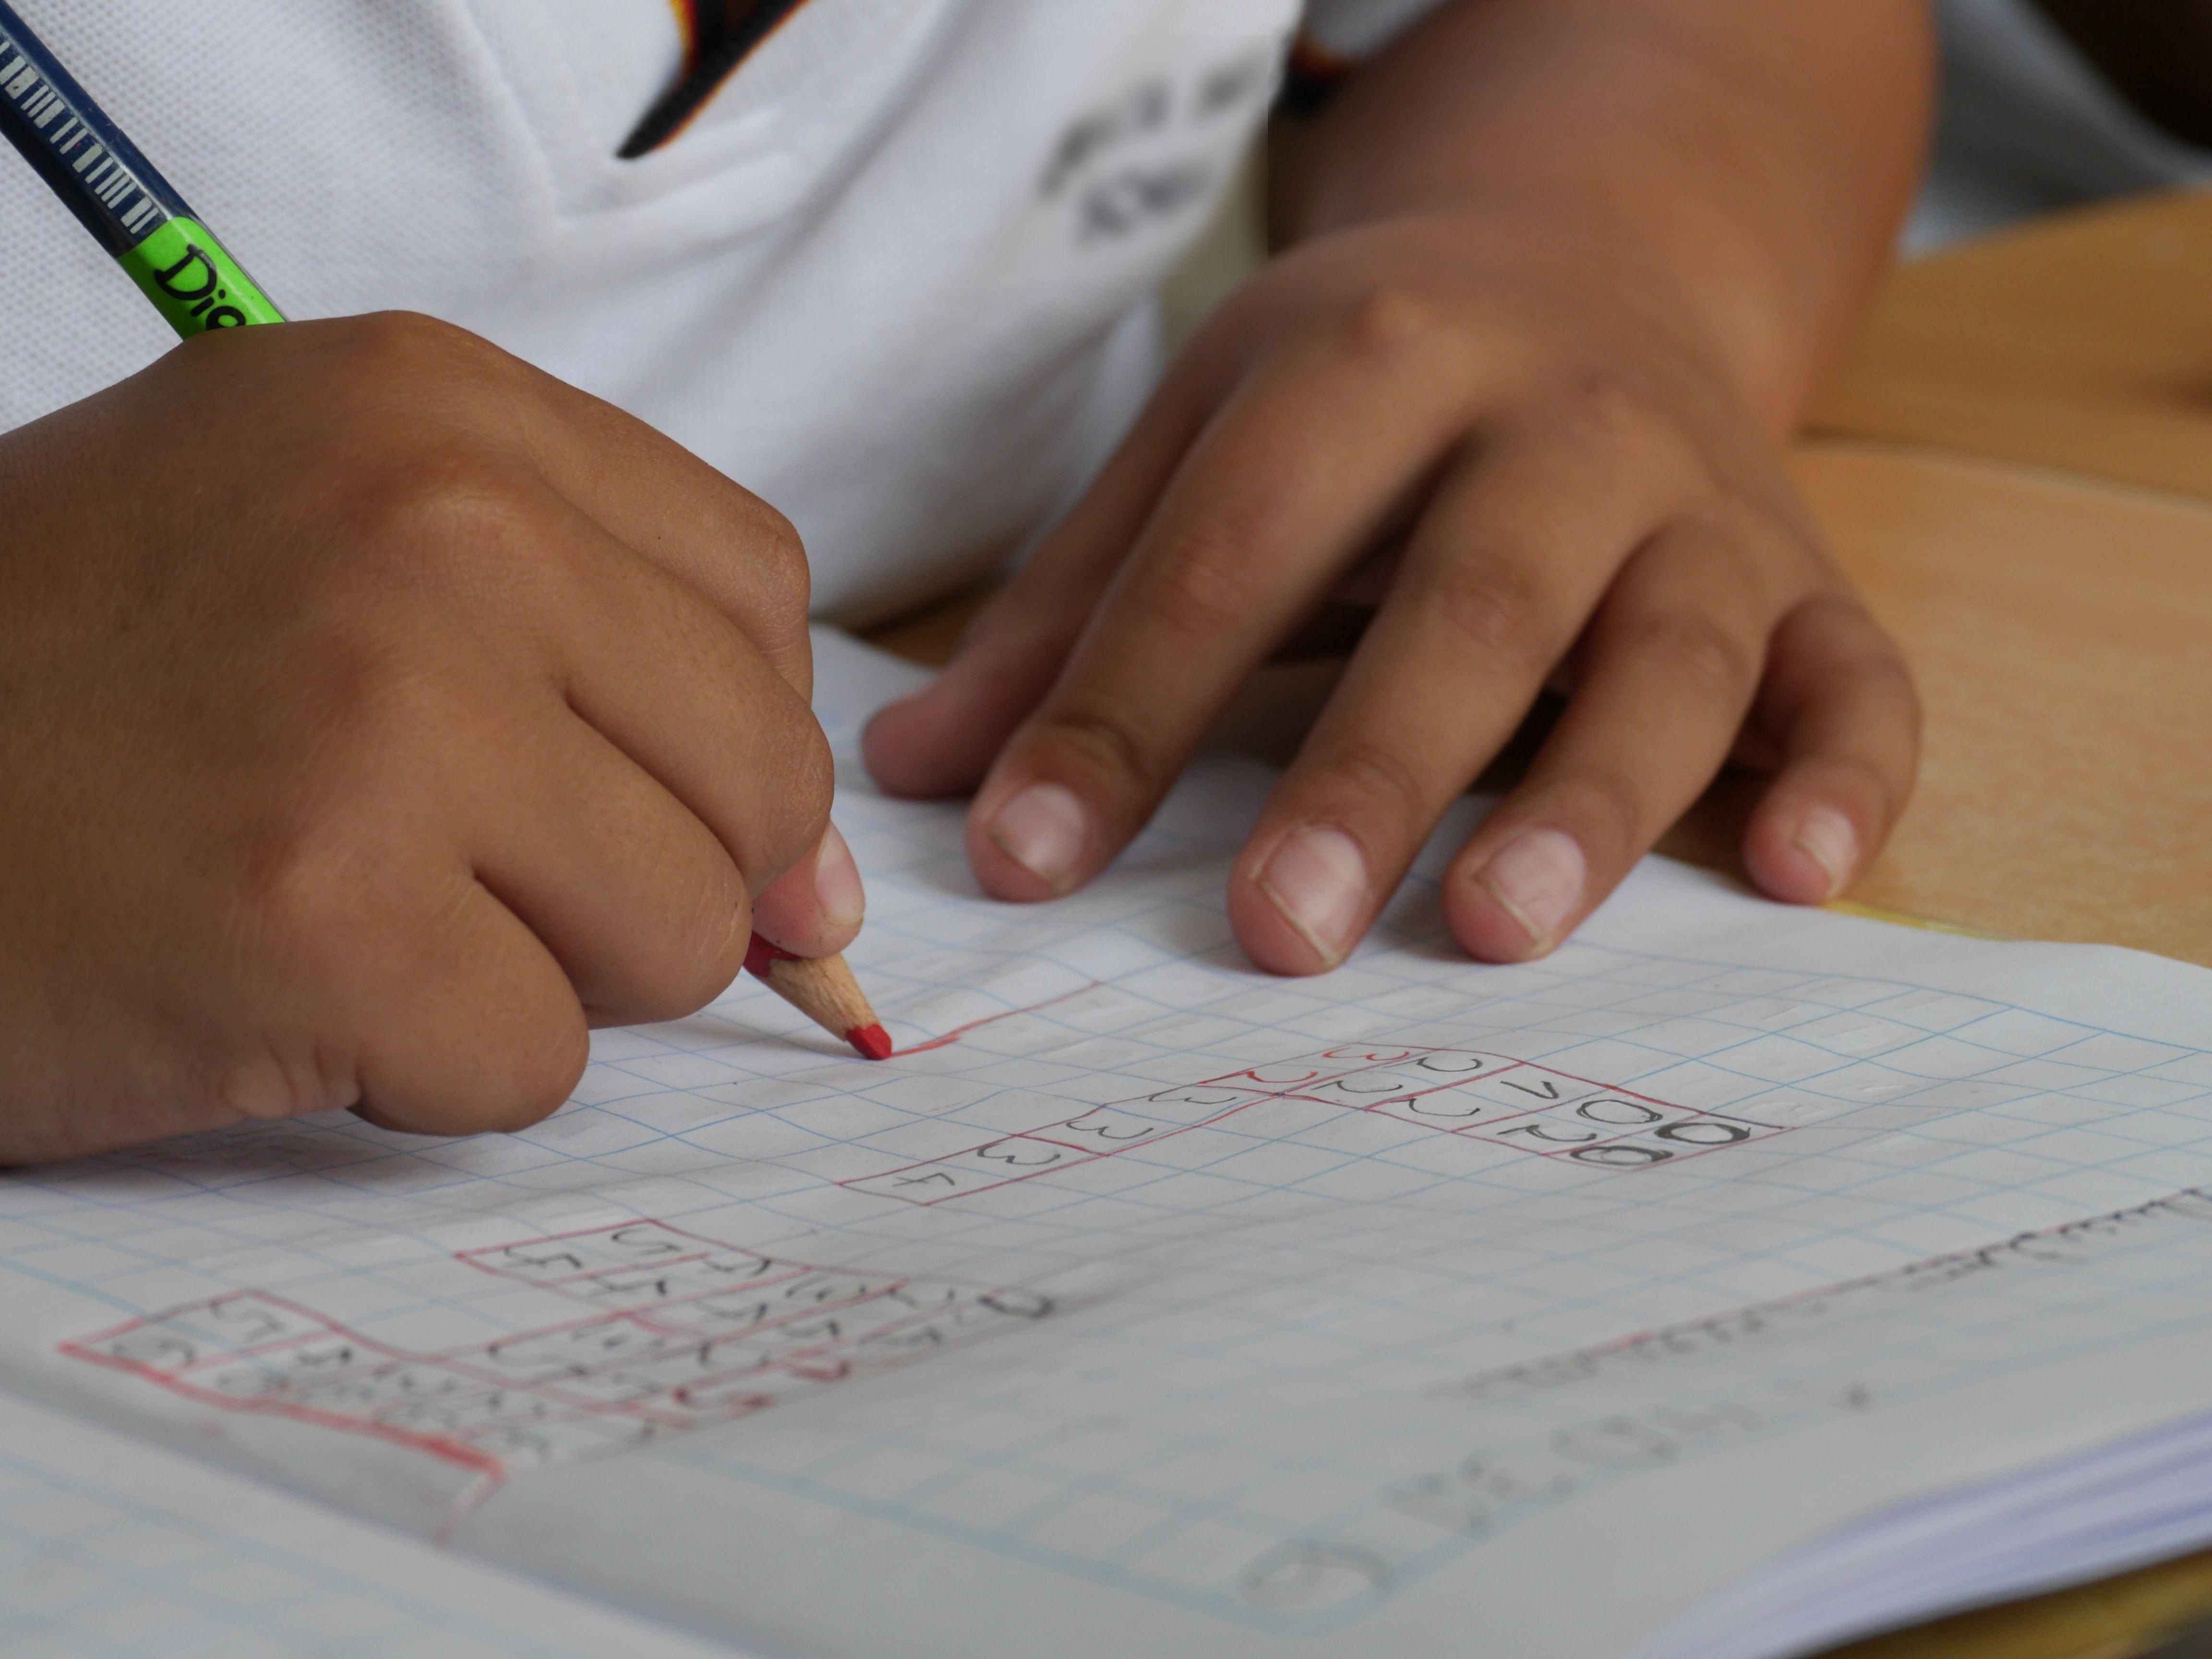 Help your child improve their math skills